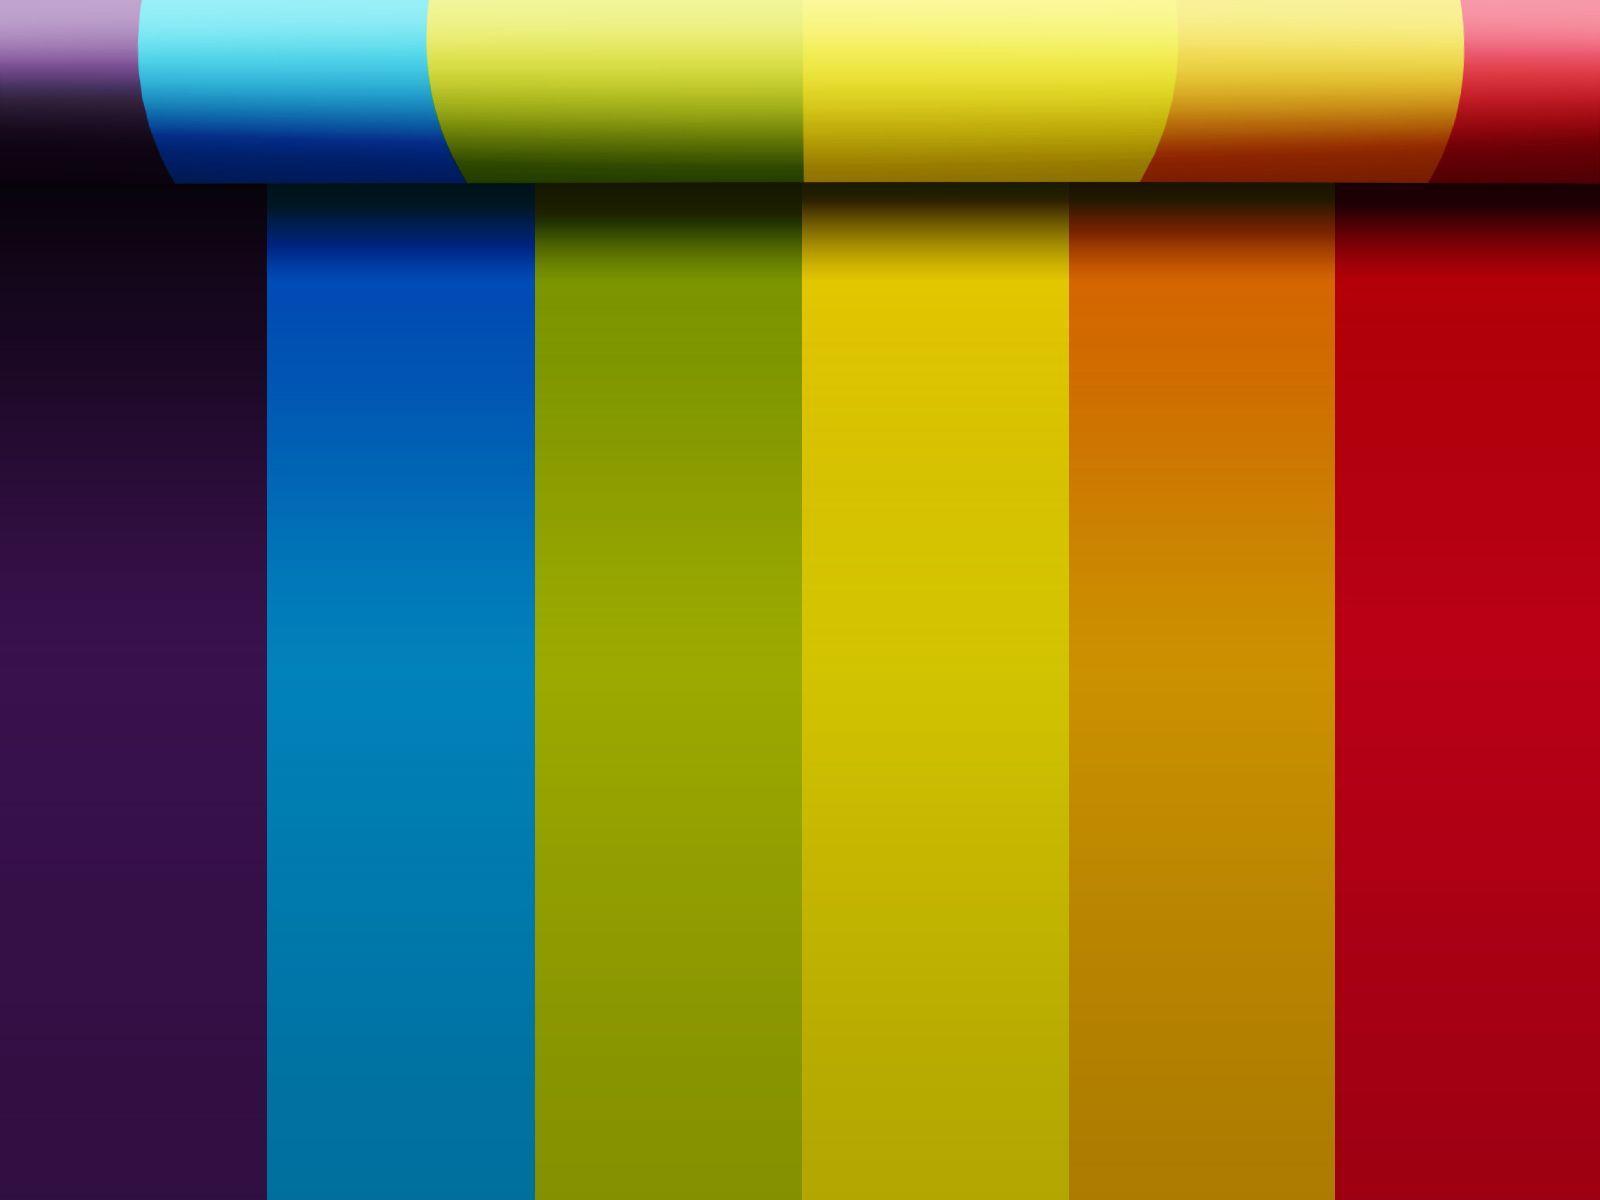 download colors hd wallpaper - photo #22